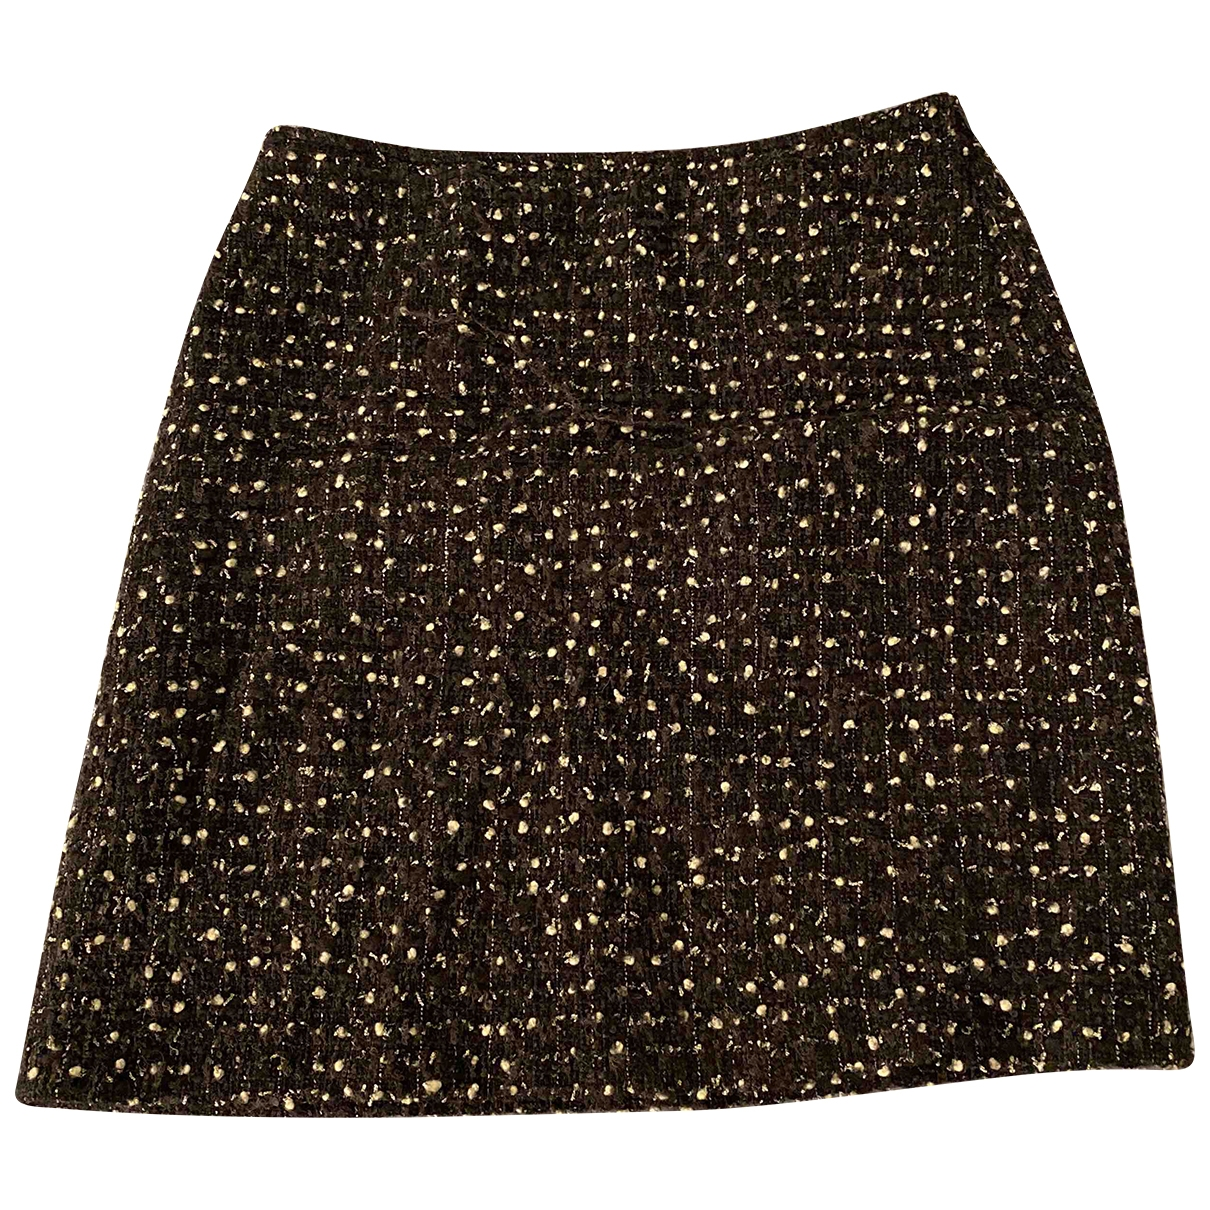 Max Mara Studio \N Wool skirt for Women 10 UK